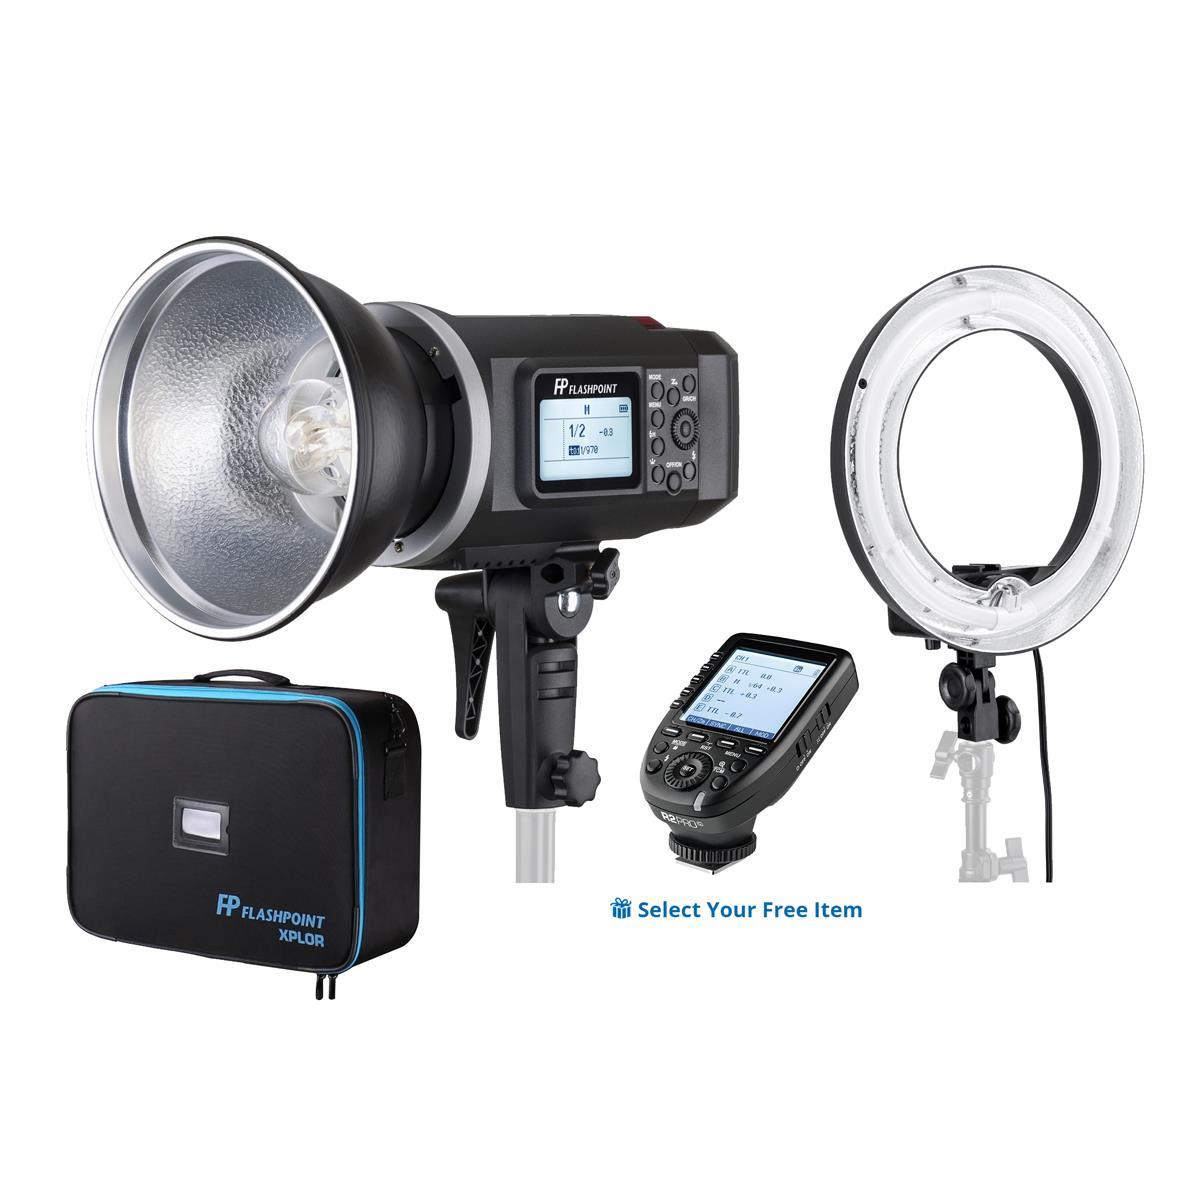 Flashpoint XPLOR 600 HSS R2 Battery-Powered Monolight Kit - Bowens Mount $429 + free shipping